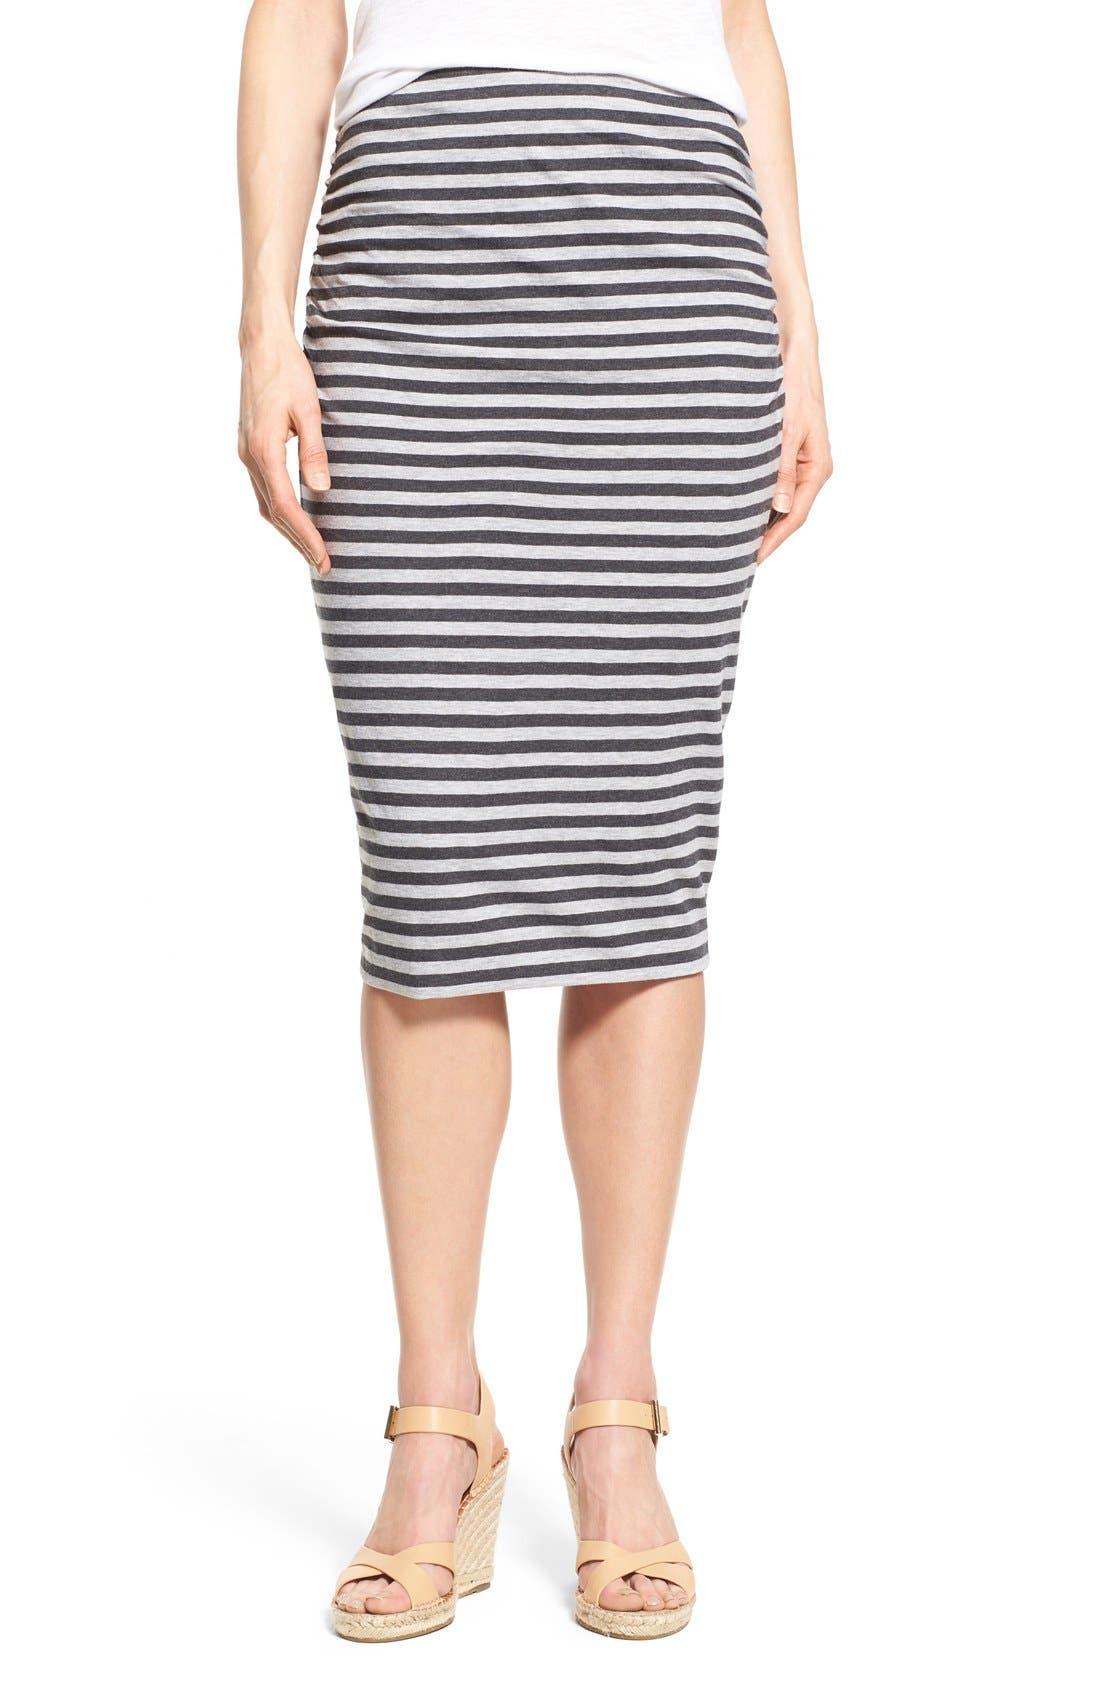 Alternate Image 1 Selected - Caslon® Side Ruched Tube Skirt